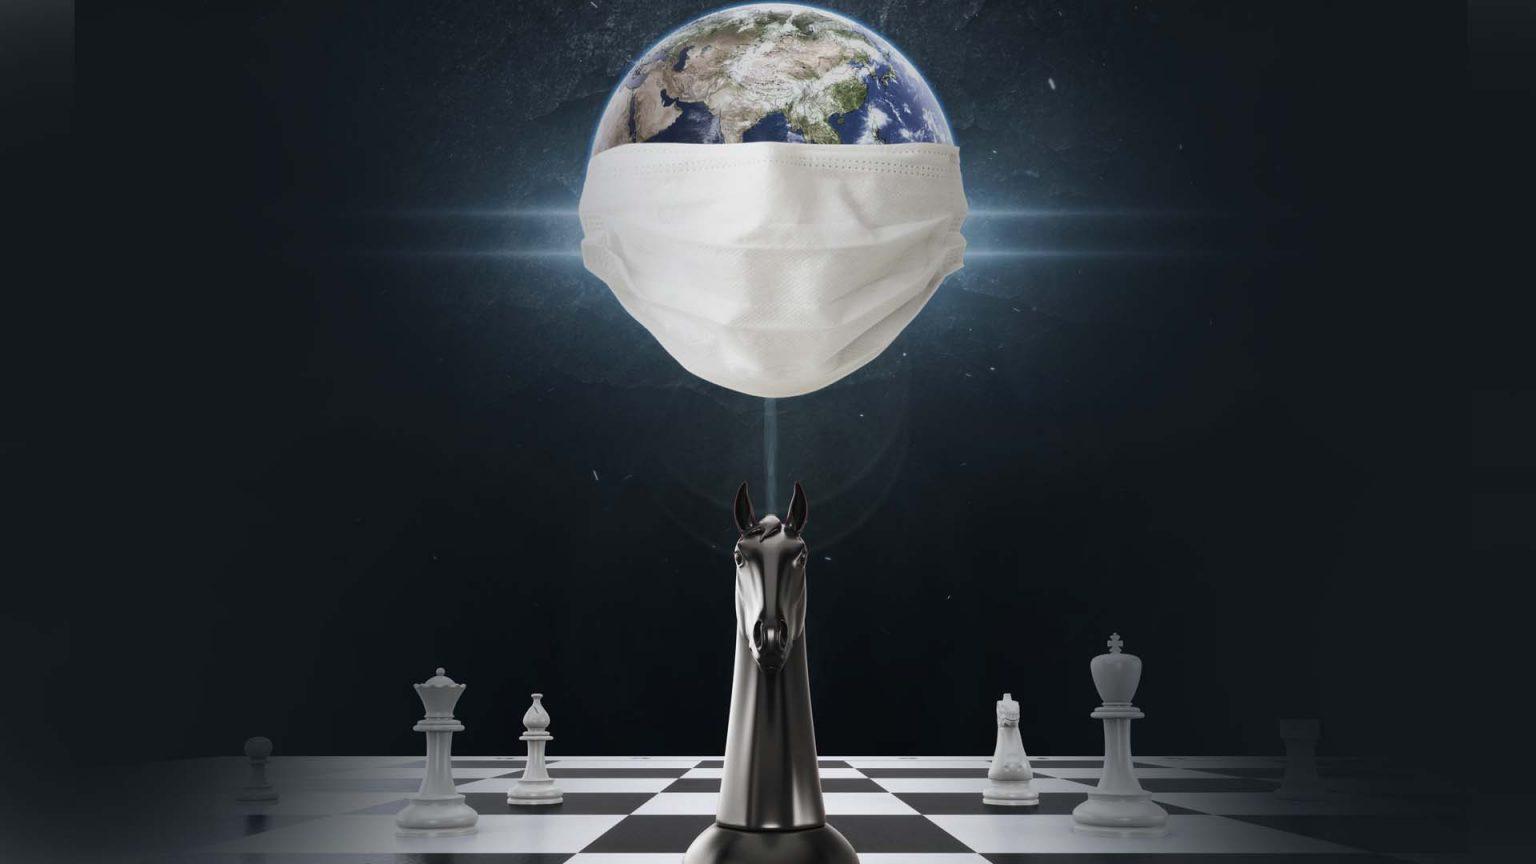 Chess & COVID-19